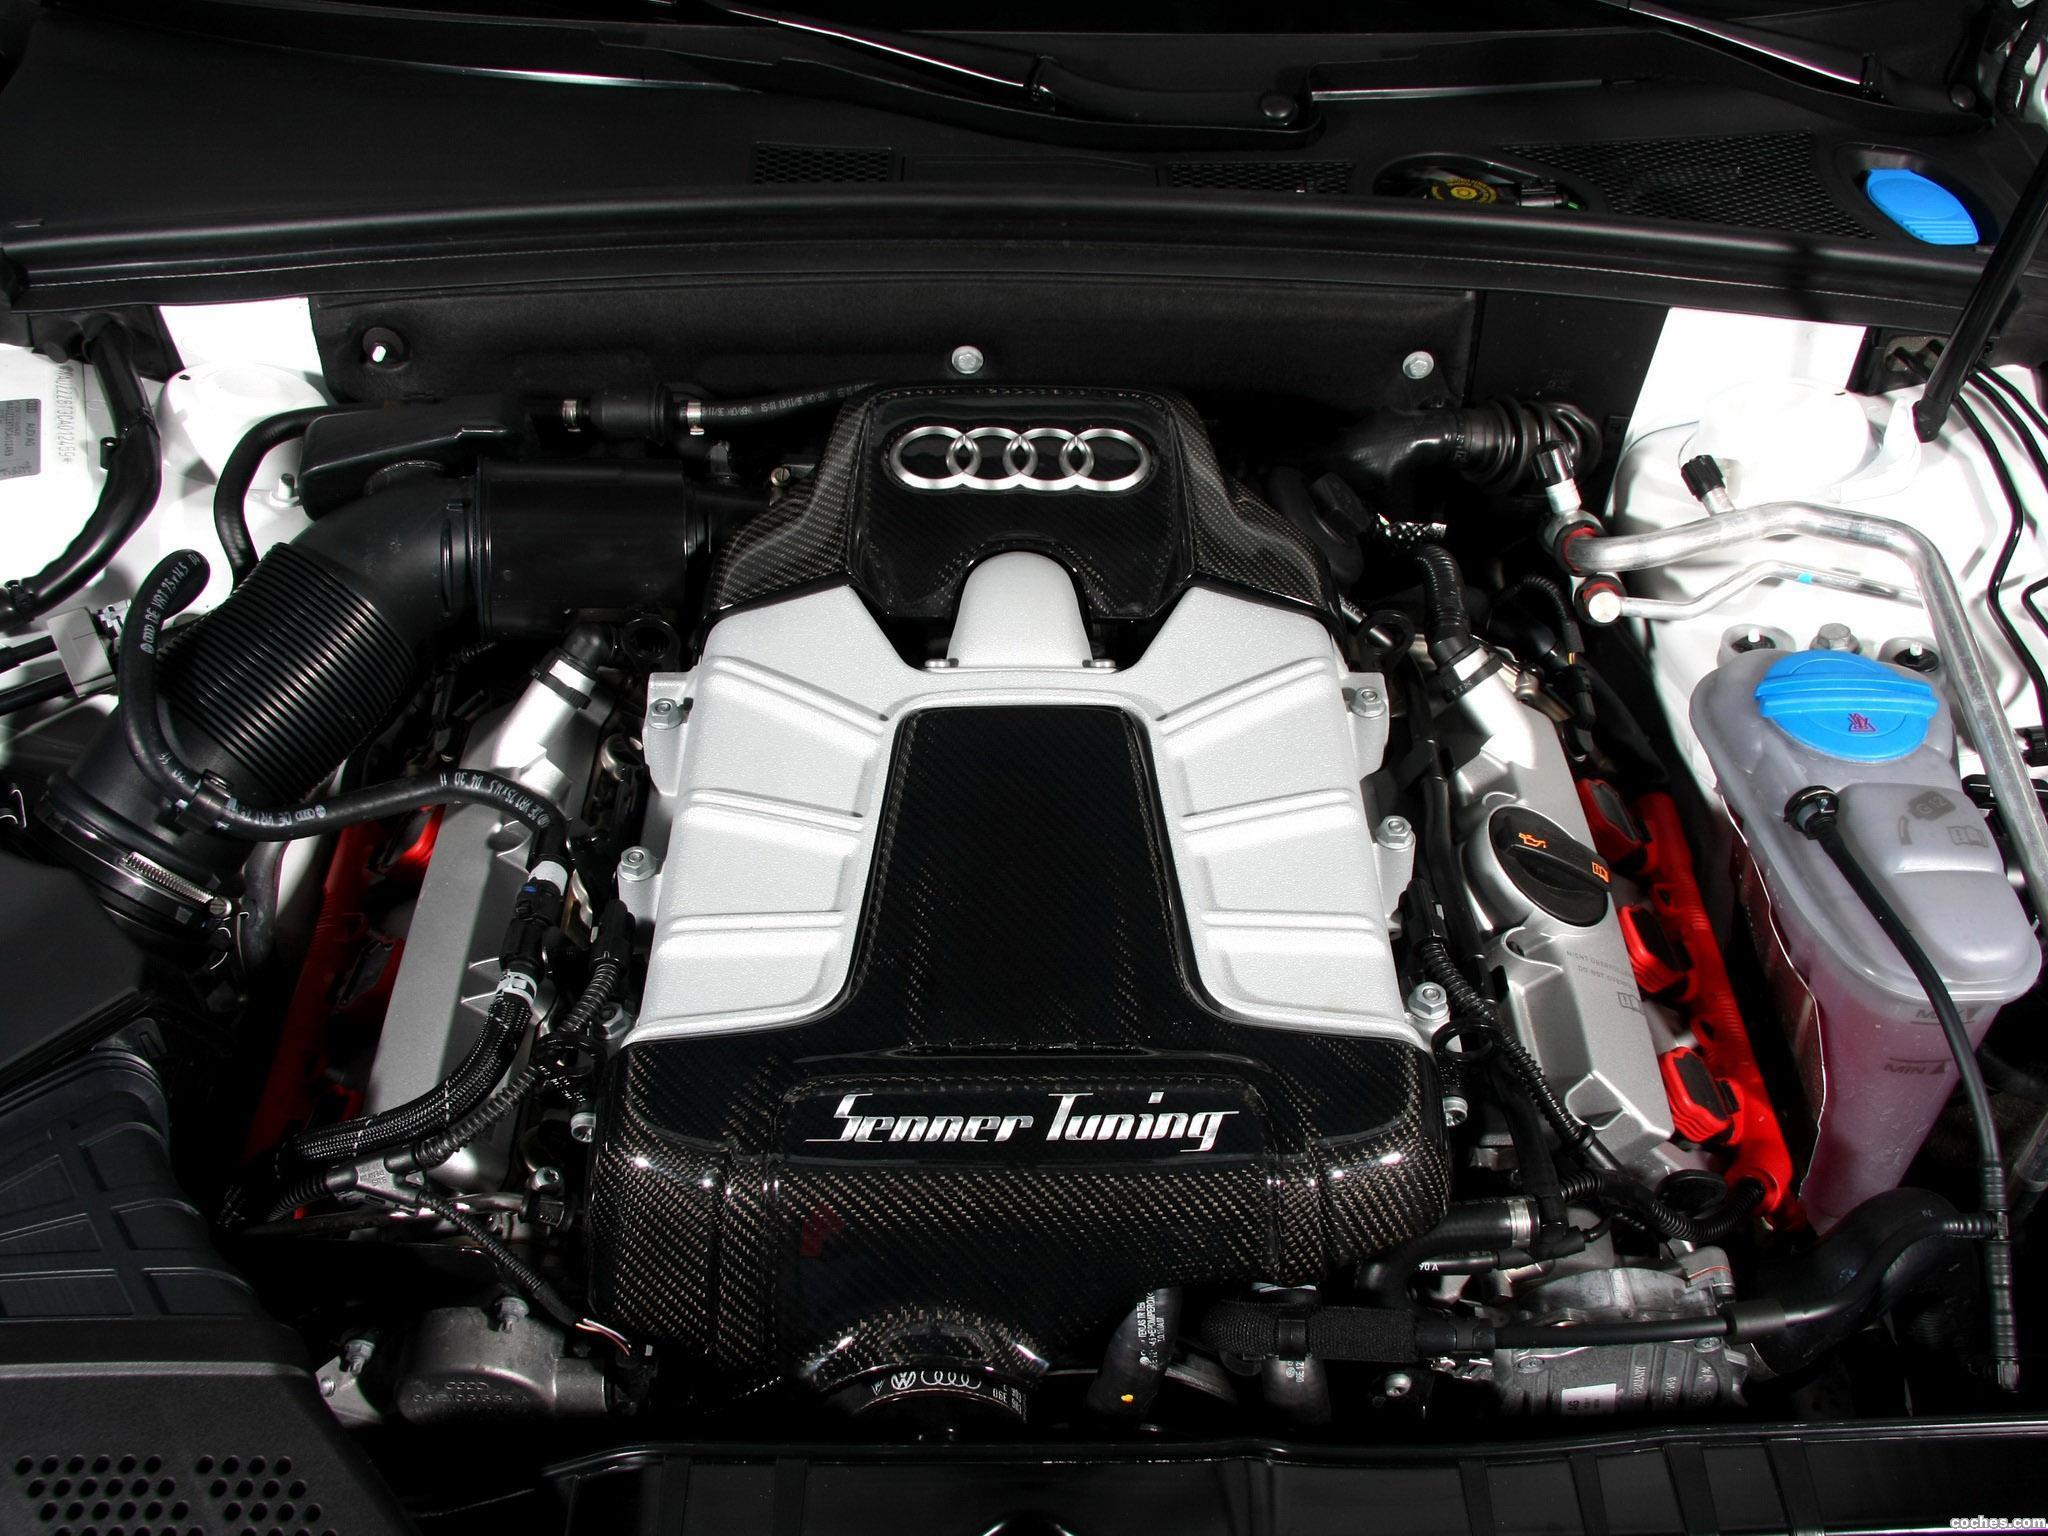 Foto 3 de Audi Senner S5 Cabriolet 2013